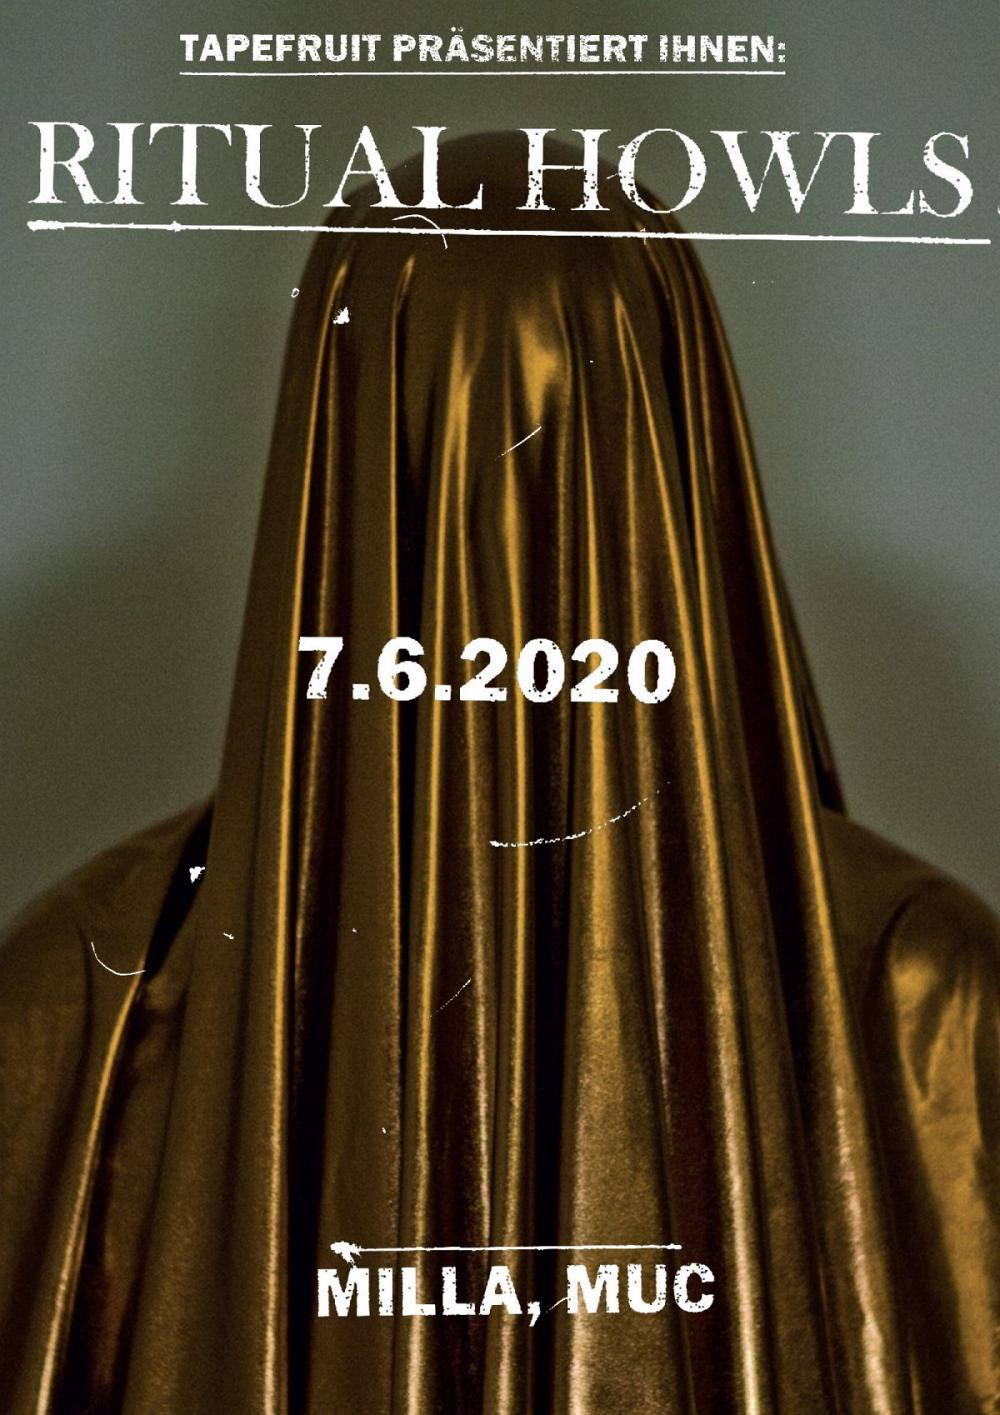 Tapefruit Konzert: Ritual Howls | 07.06.2020 @ Milla Club